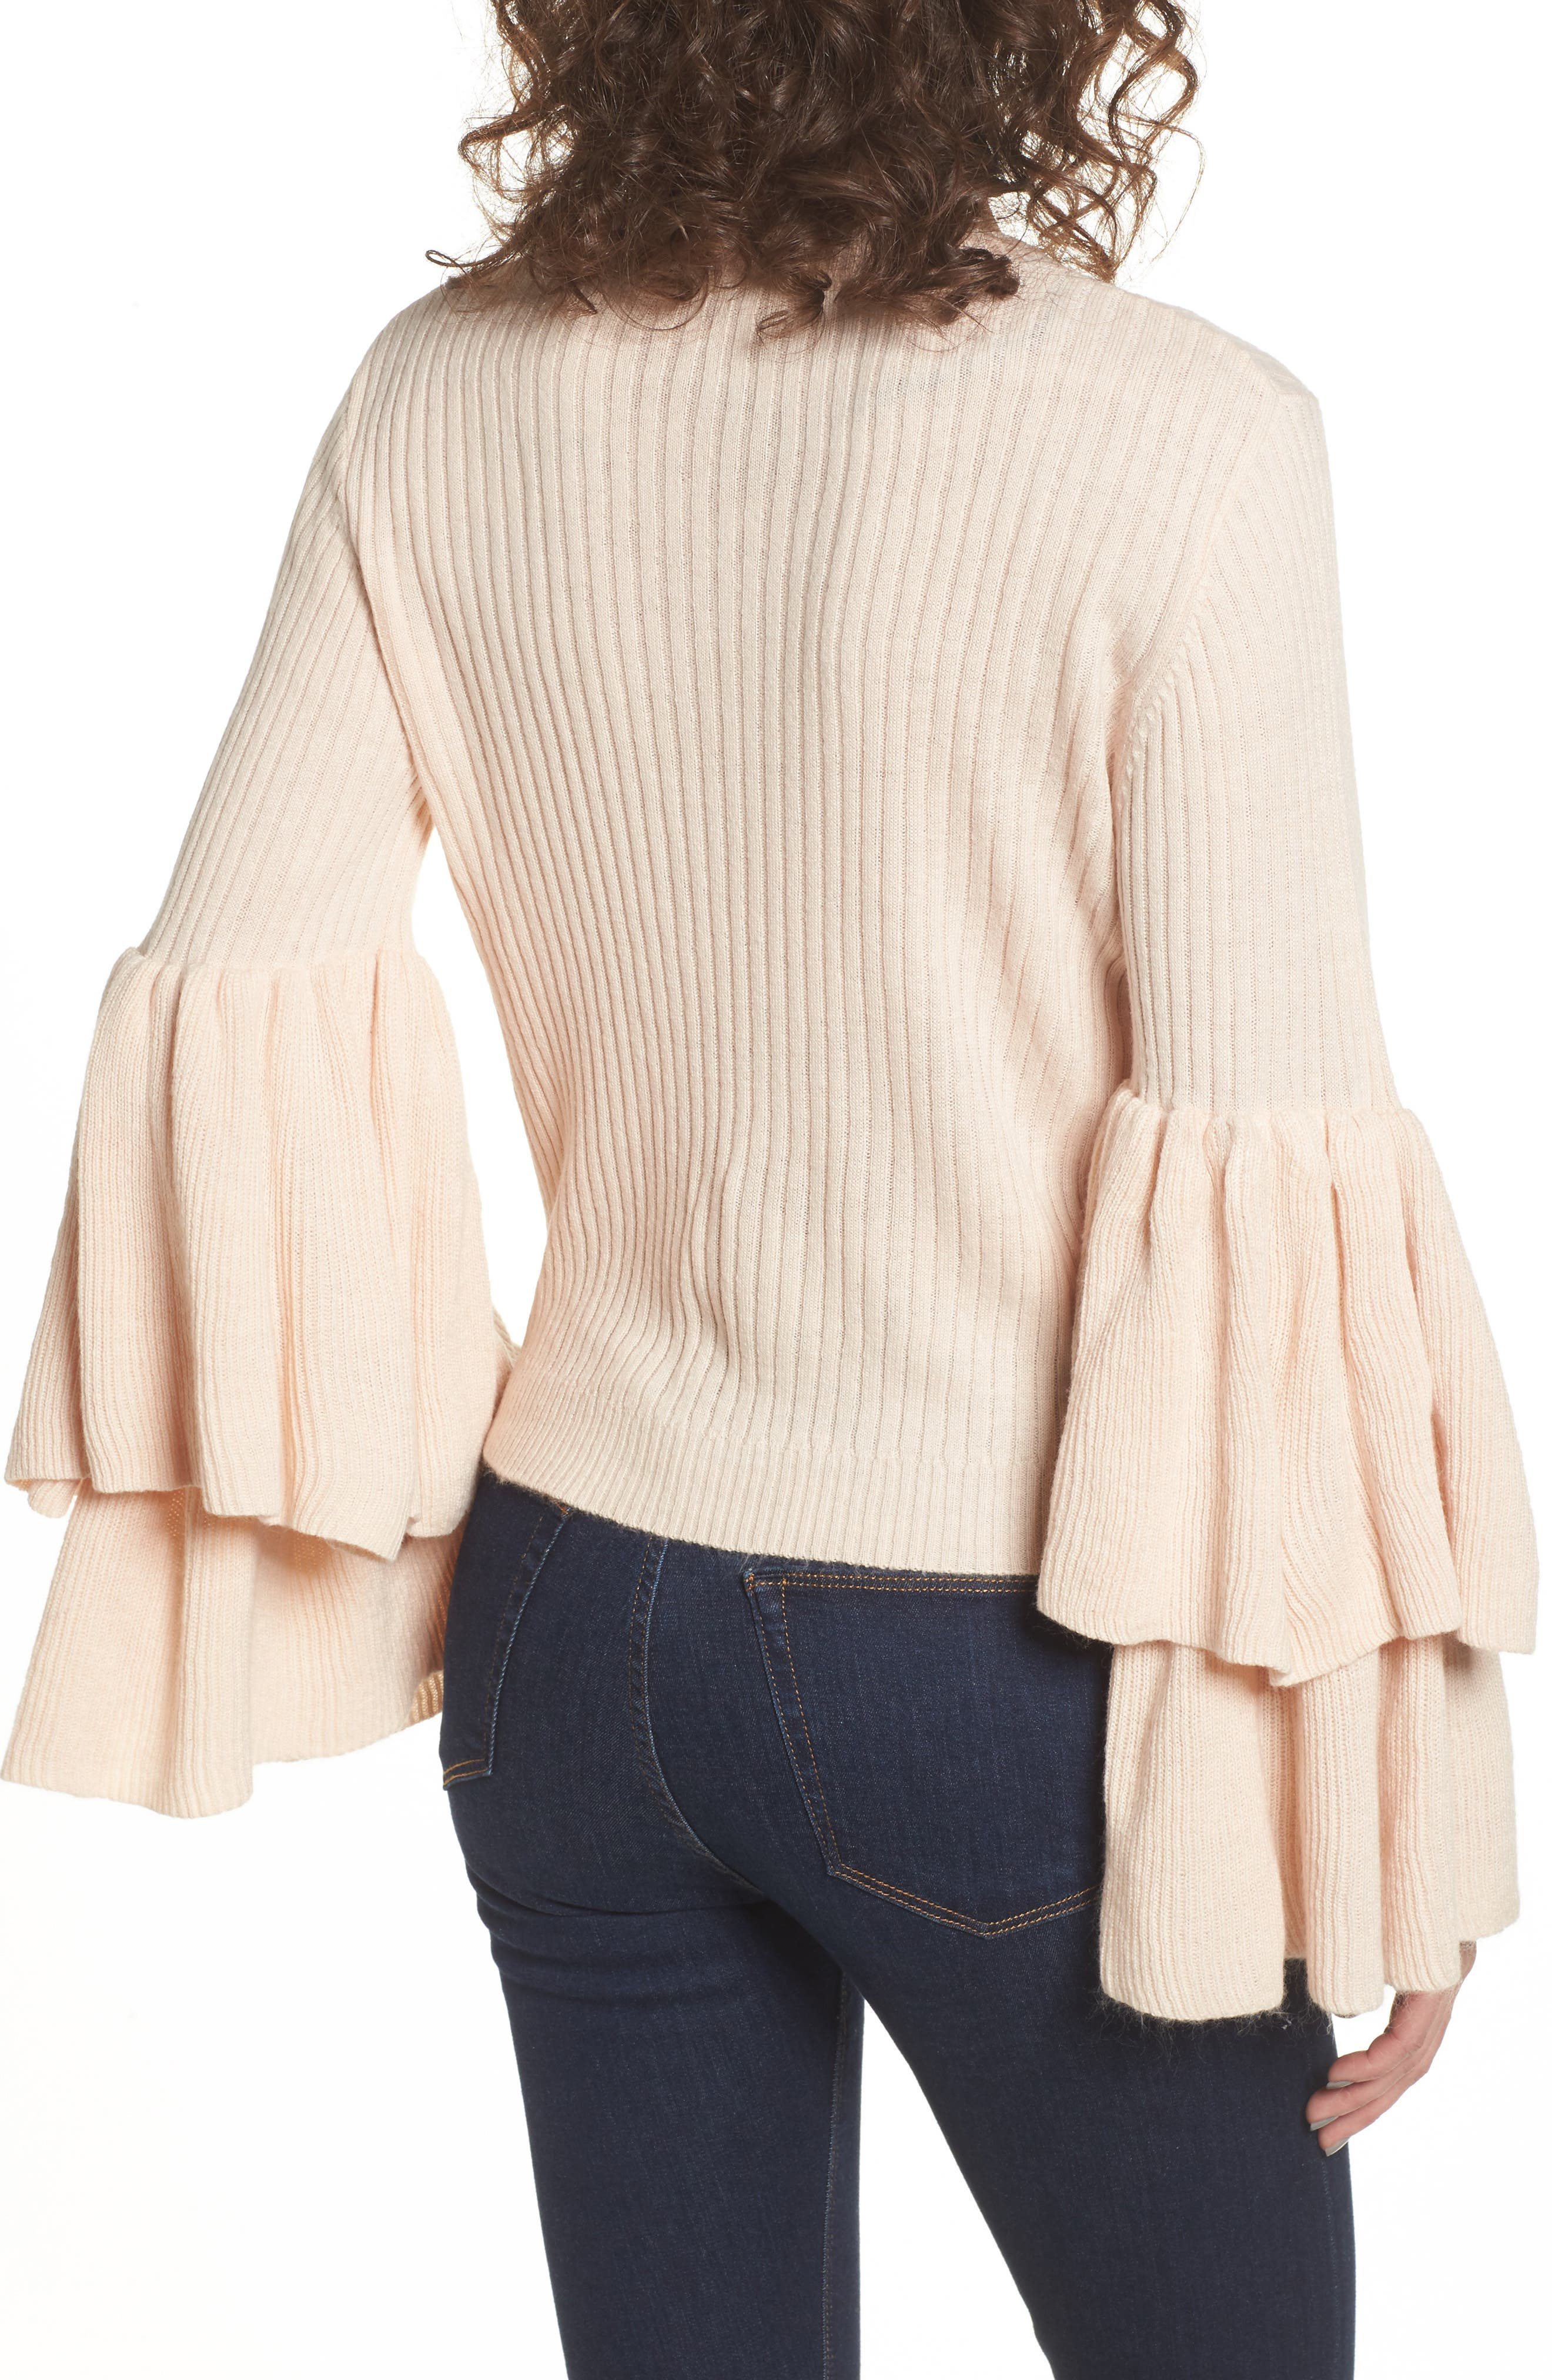 Tiara Bell Sleeve Sweater,                             Alternate thumbnail 2, color,                             Blush